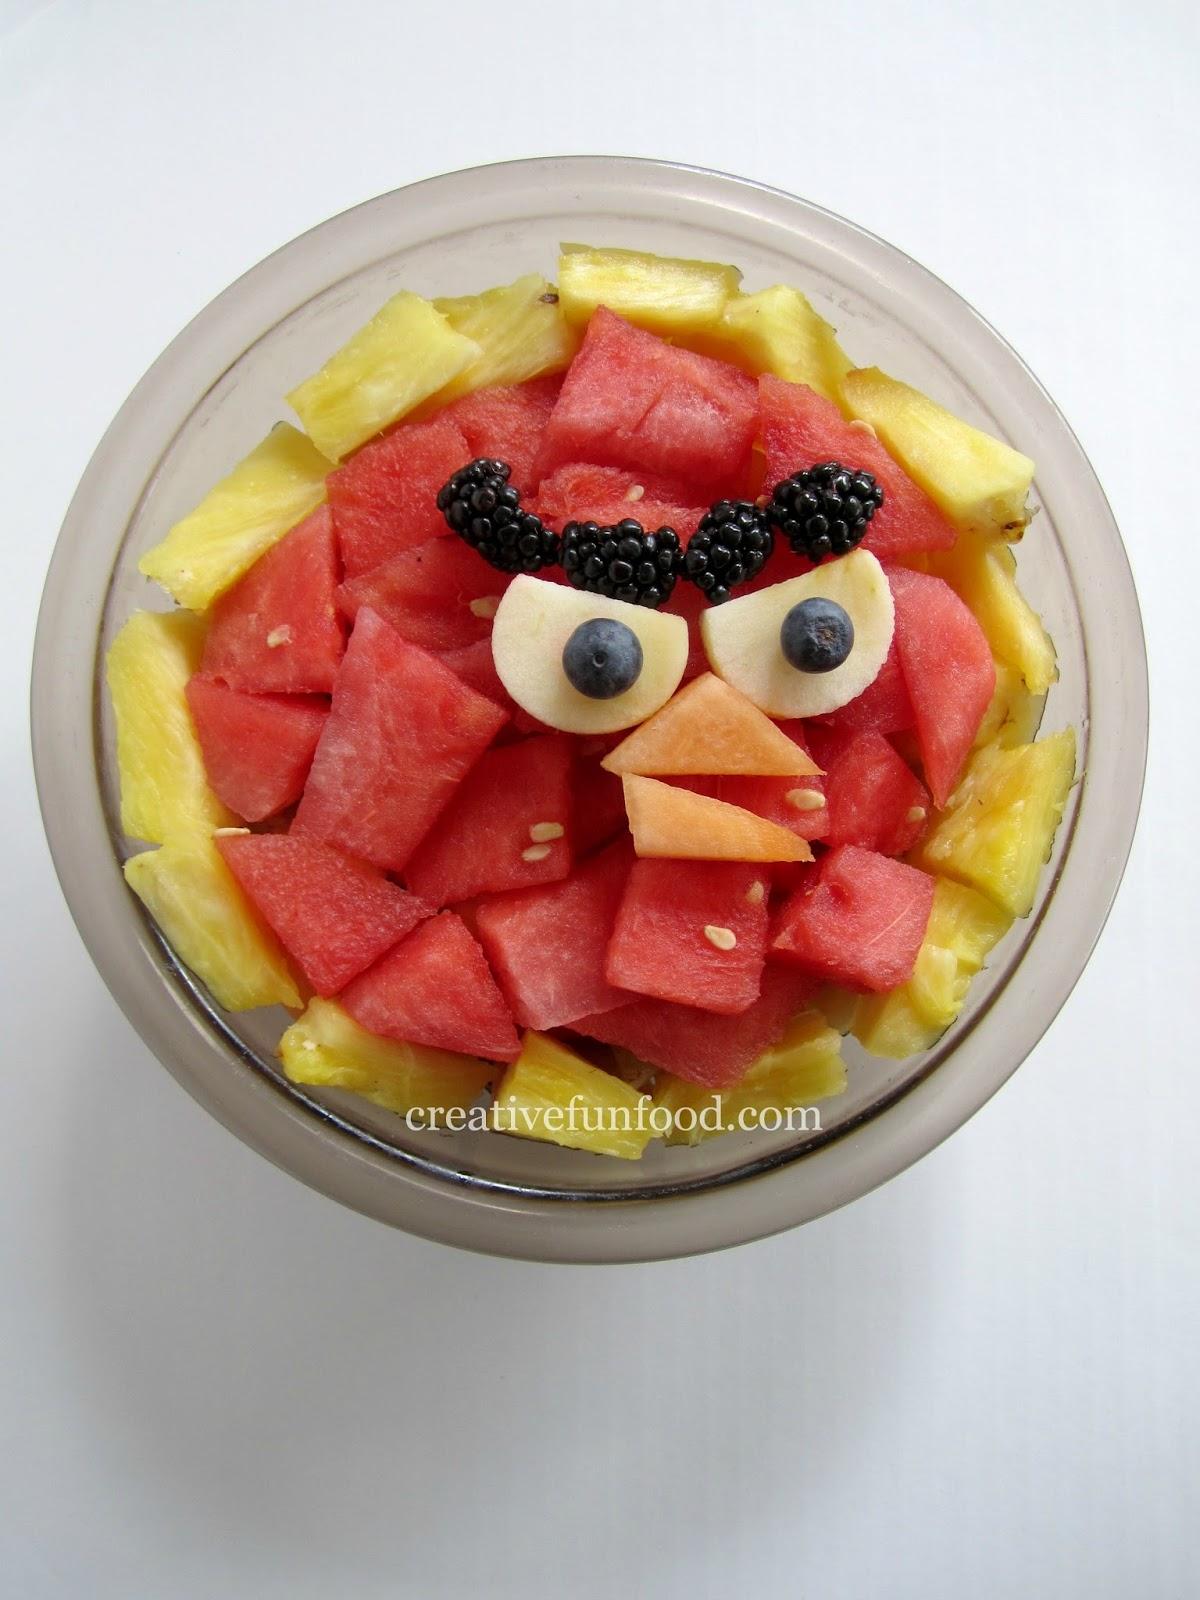 Angry birds party ideas festive ideas for birthday parties for Creation cuisine